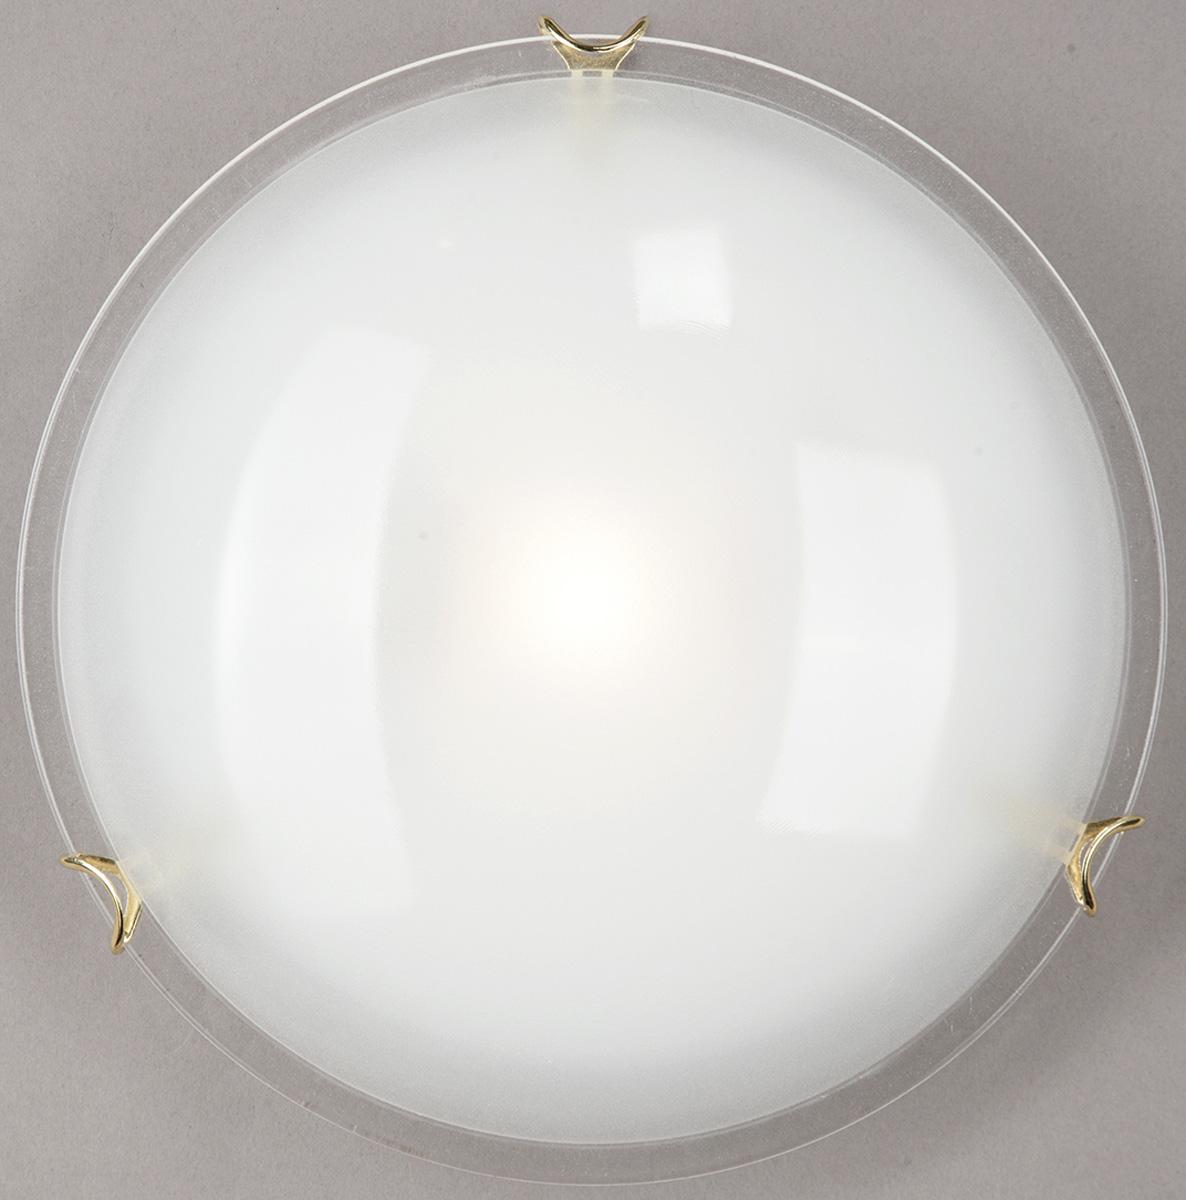 Светильник настенный Vitaluce, 1 х E27, 100W. V6281/1AV6281/1A